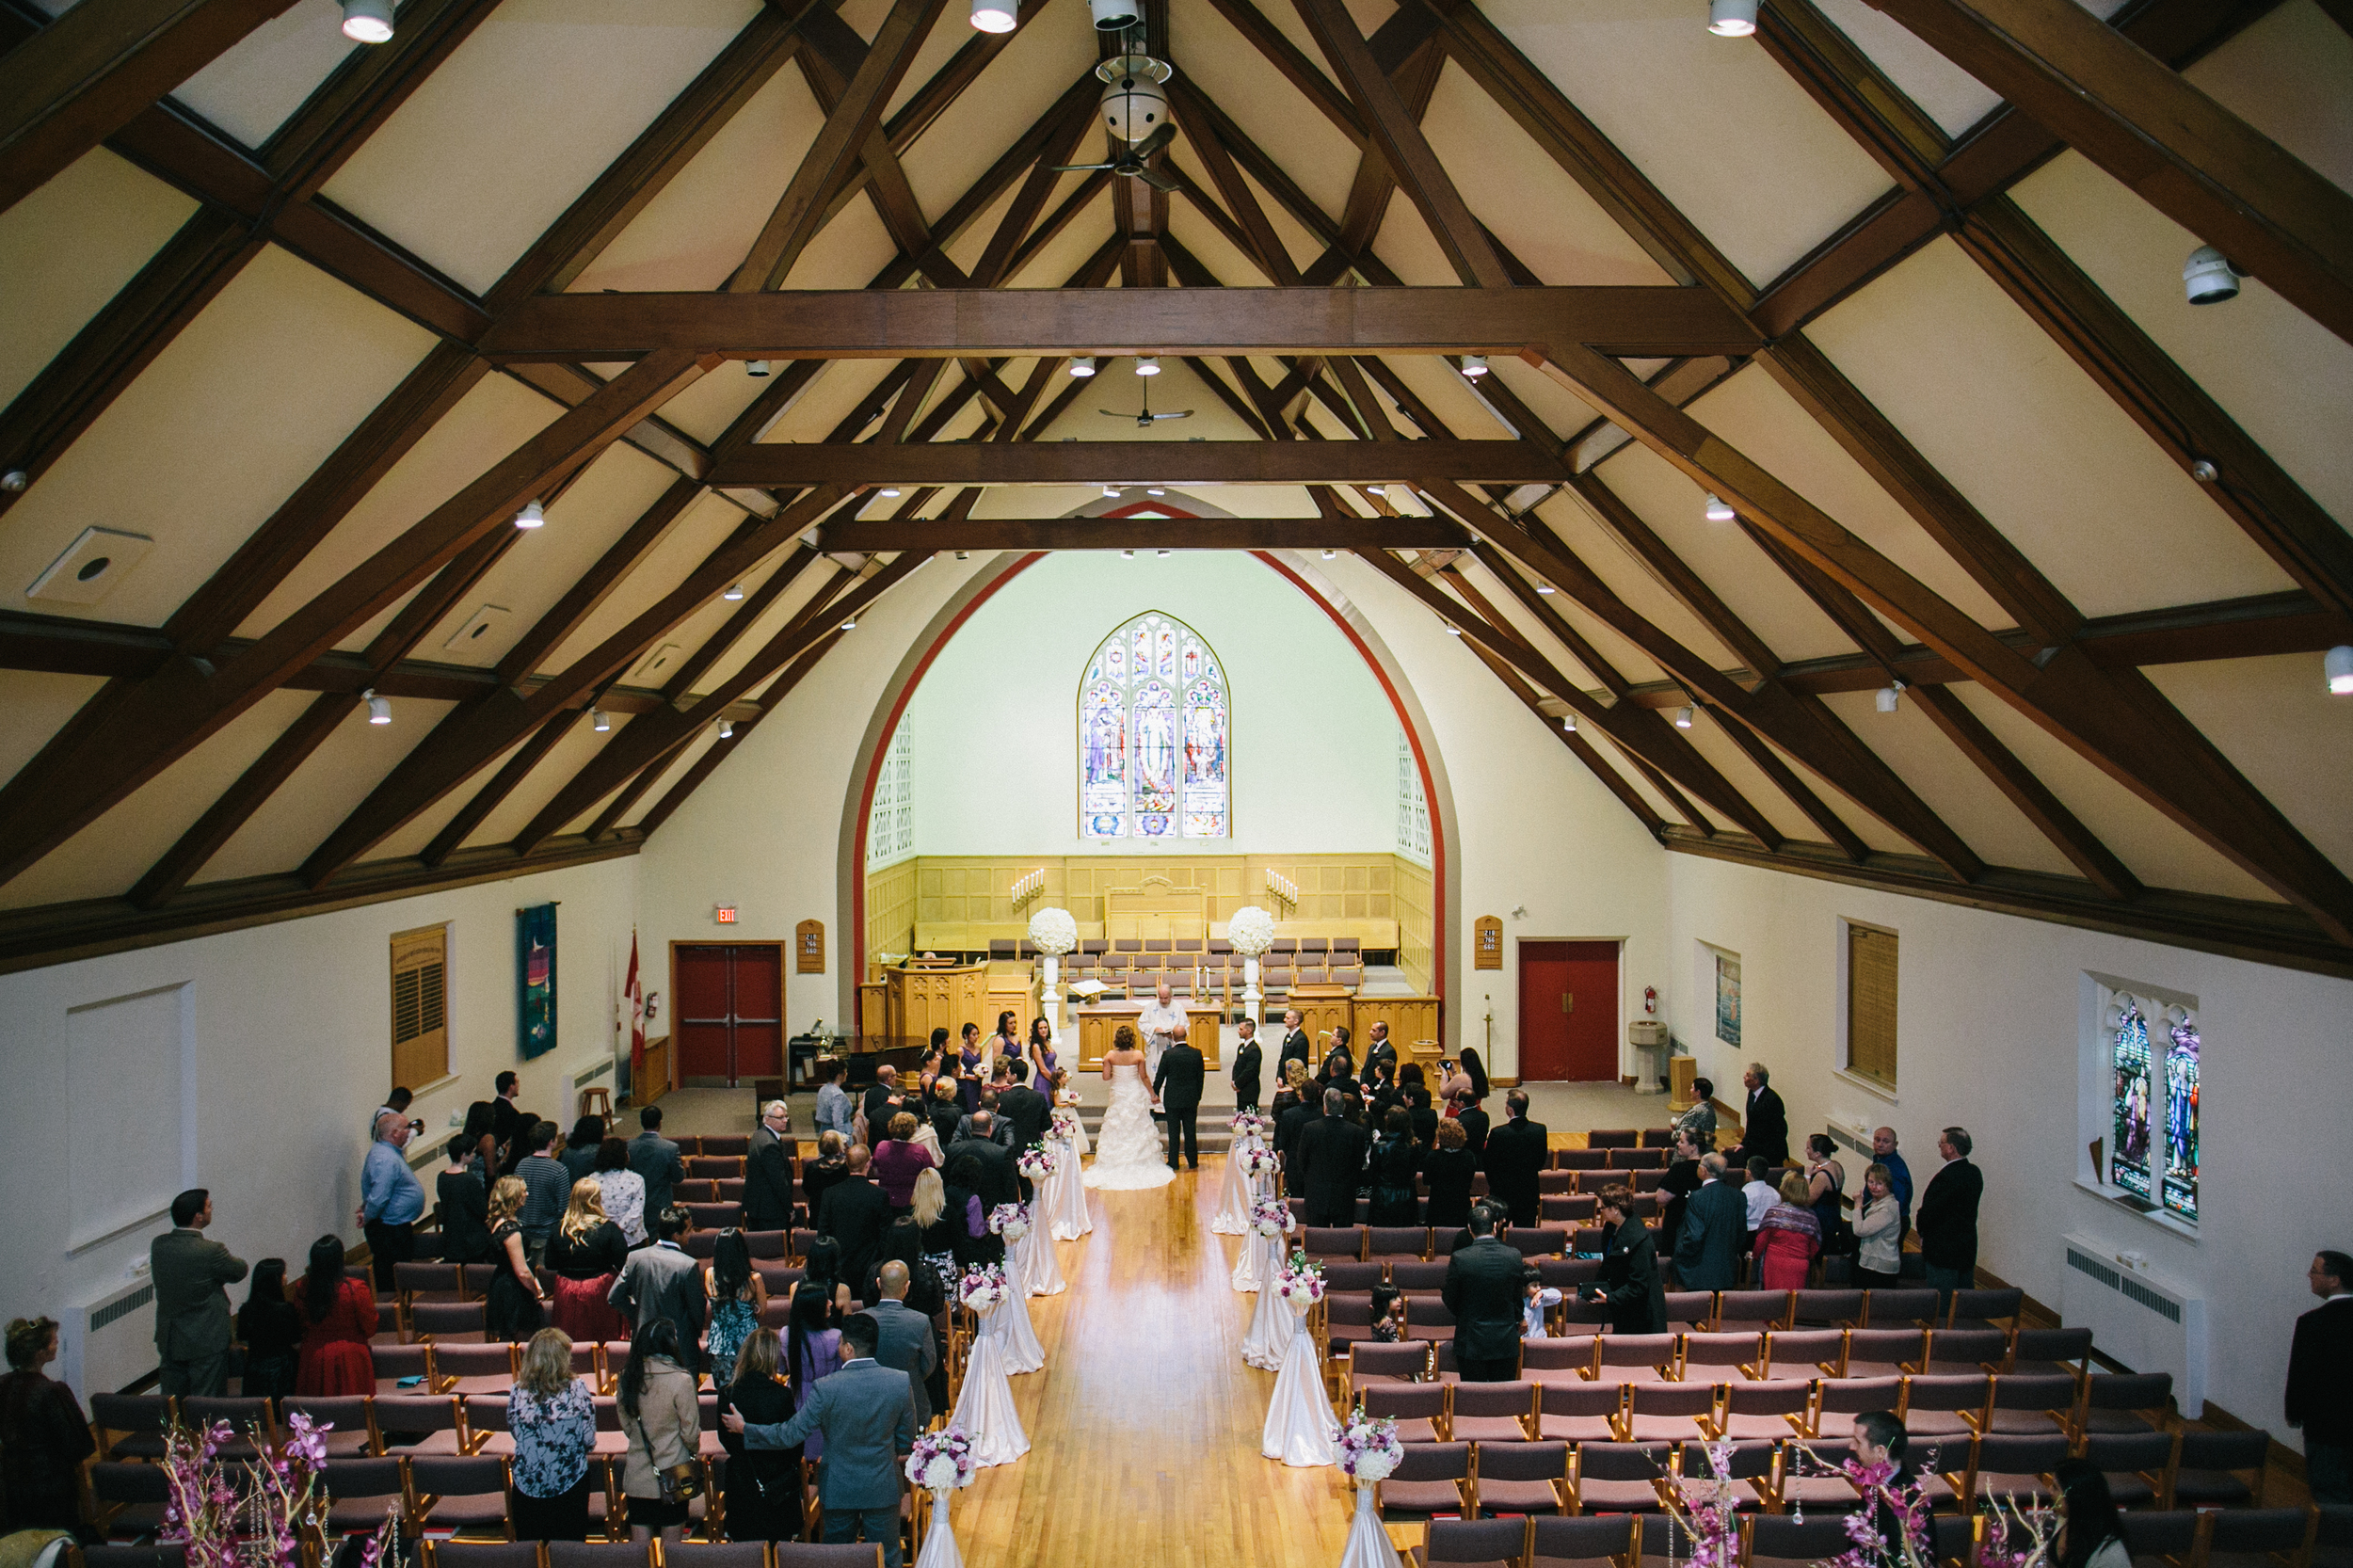 Stephanie-Kyle-paradise-banquet-hall-michael-rousseau-photography-best-toronto-wedding-photographer-documentary-wedding026.JPG